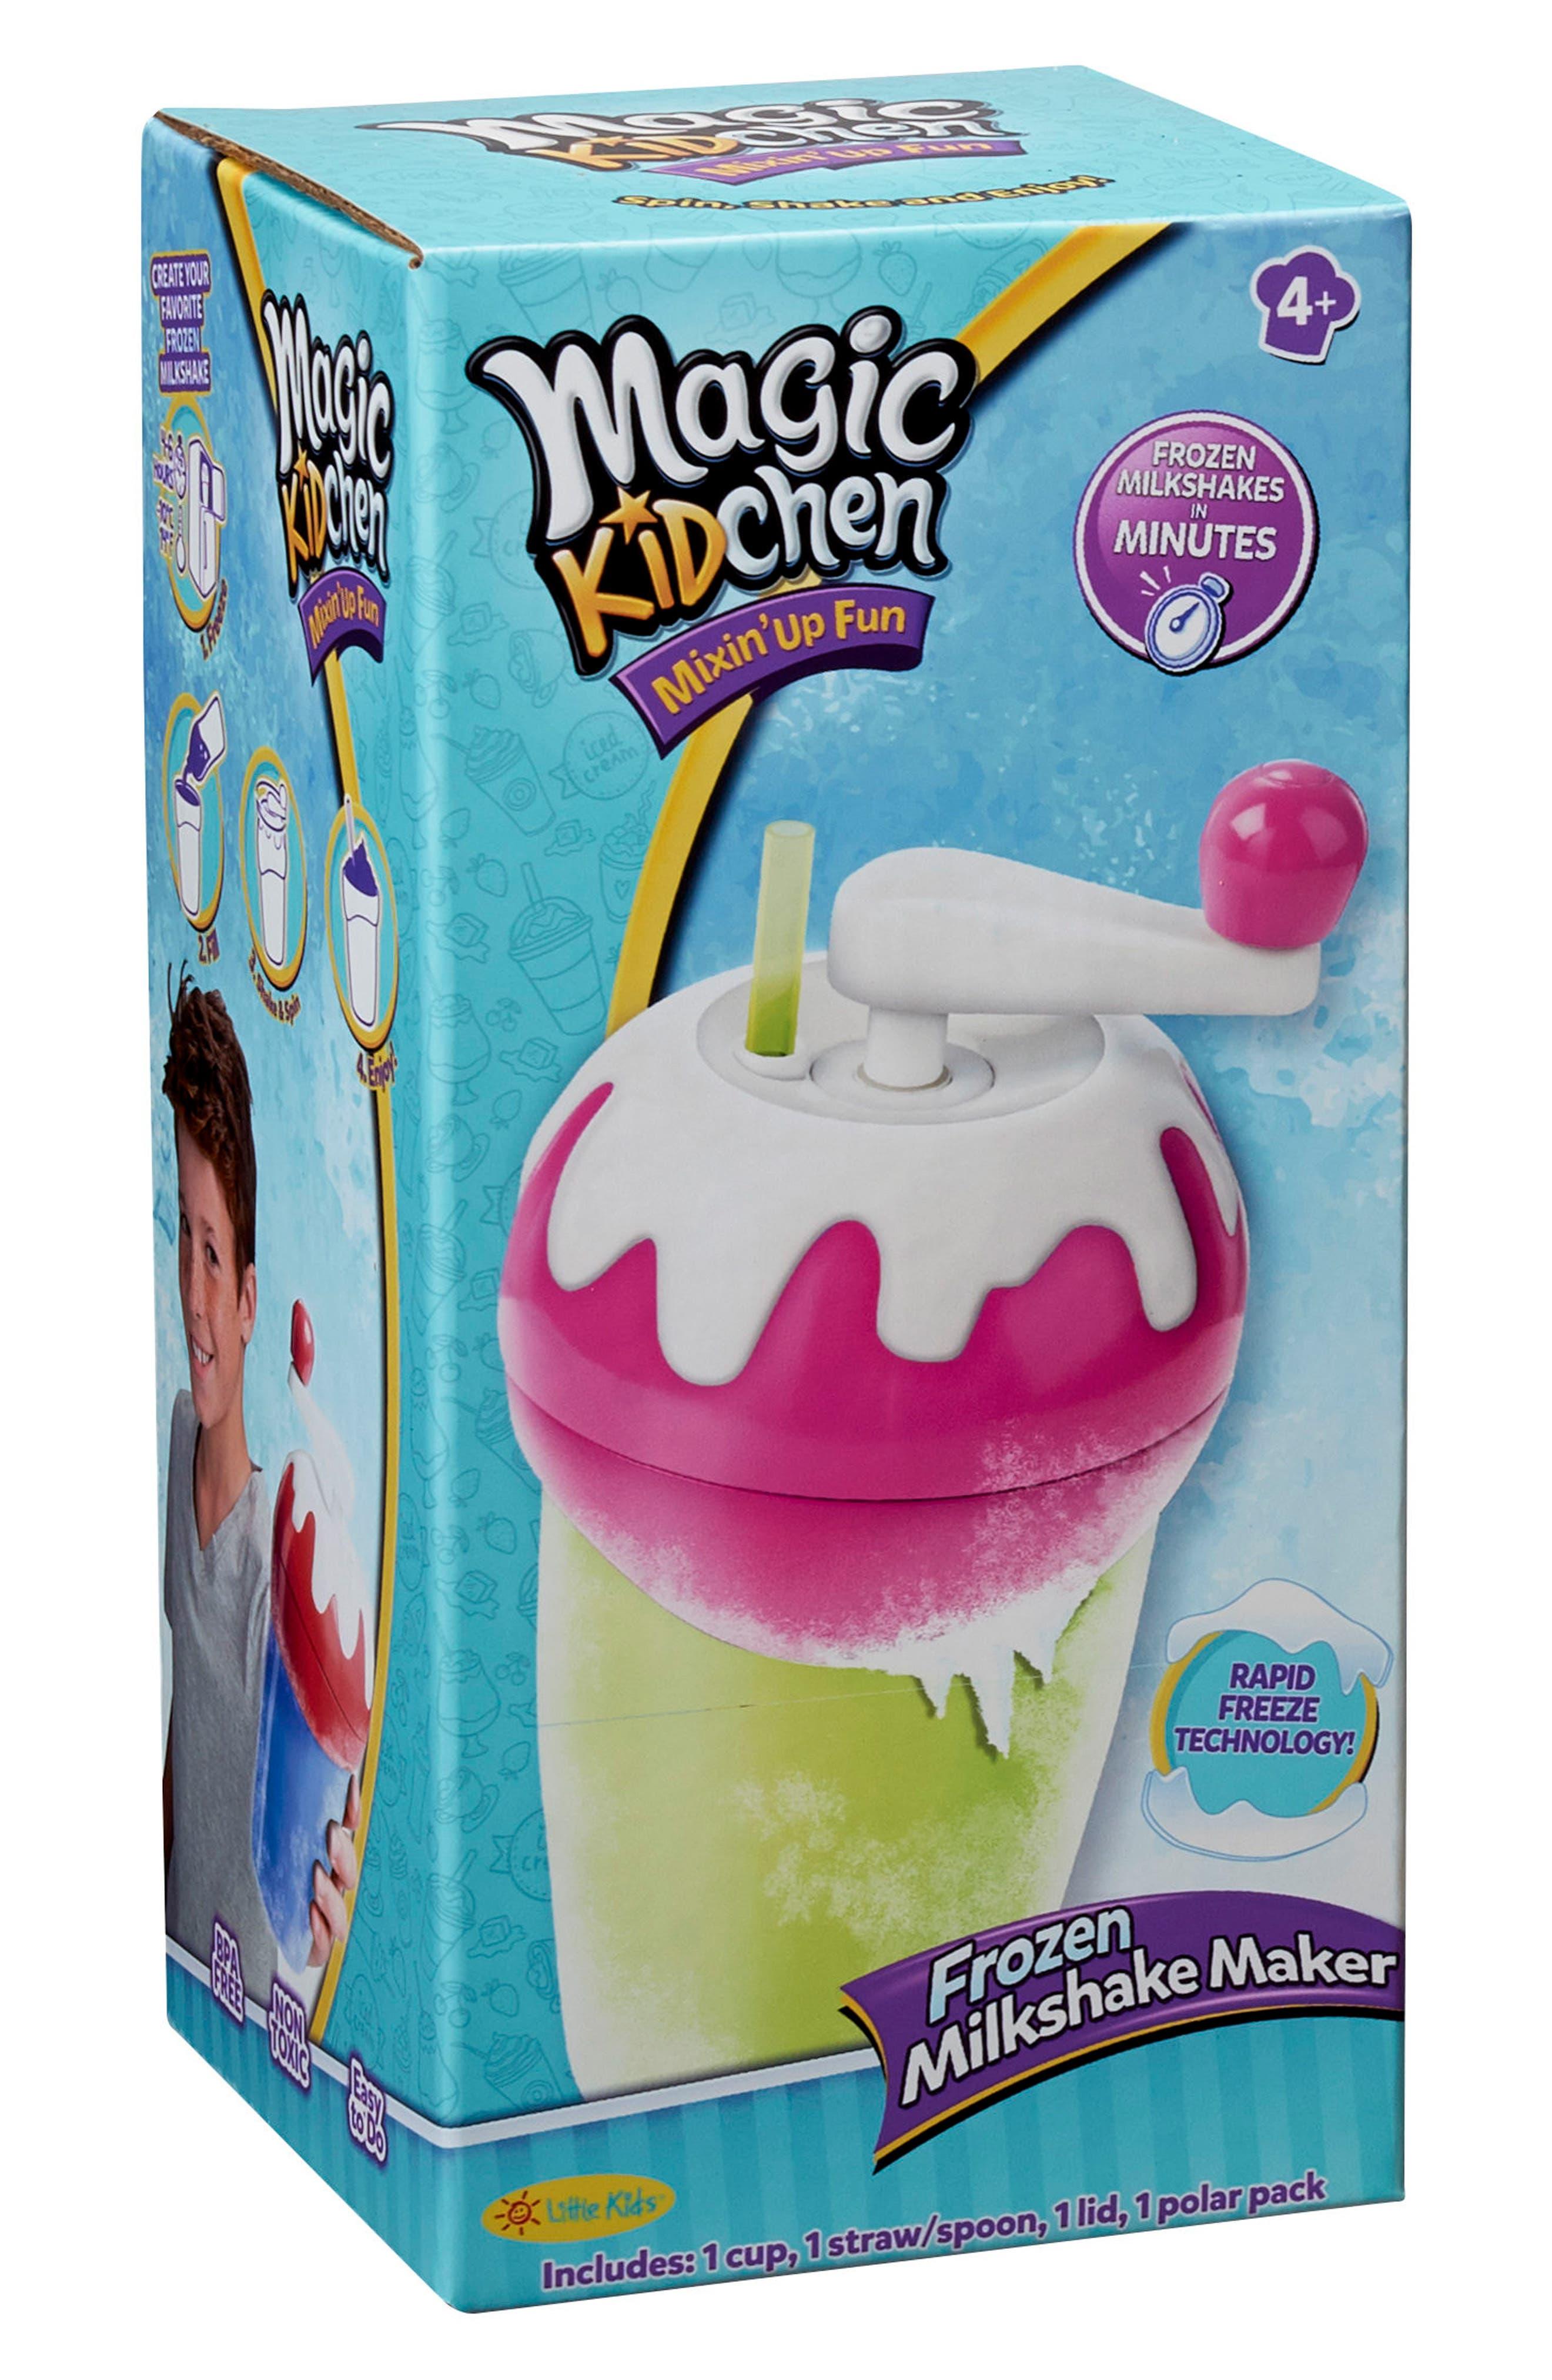 Magic Kidchen Frozen Milkshake Maker,                             Main thumbnail 1, color,                             Multi